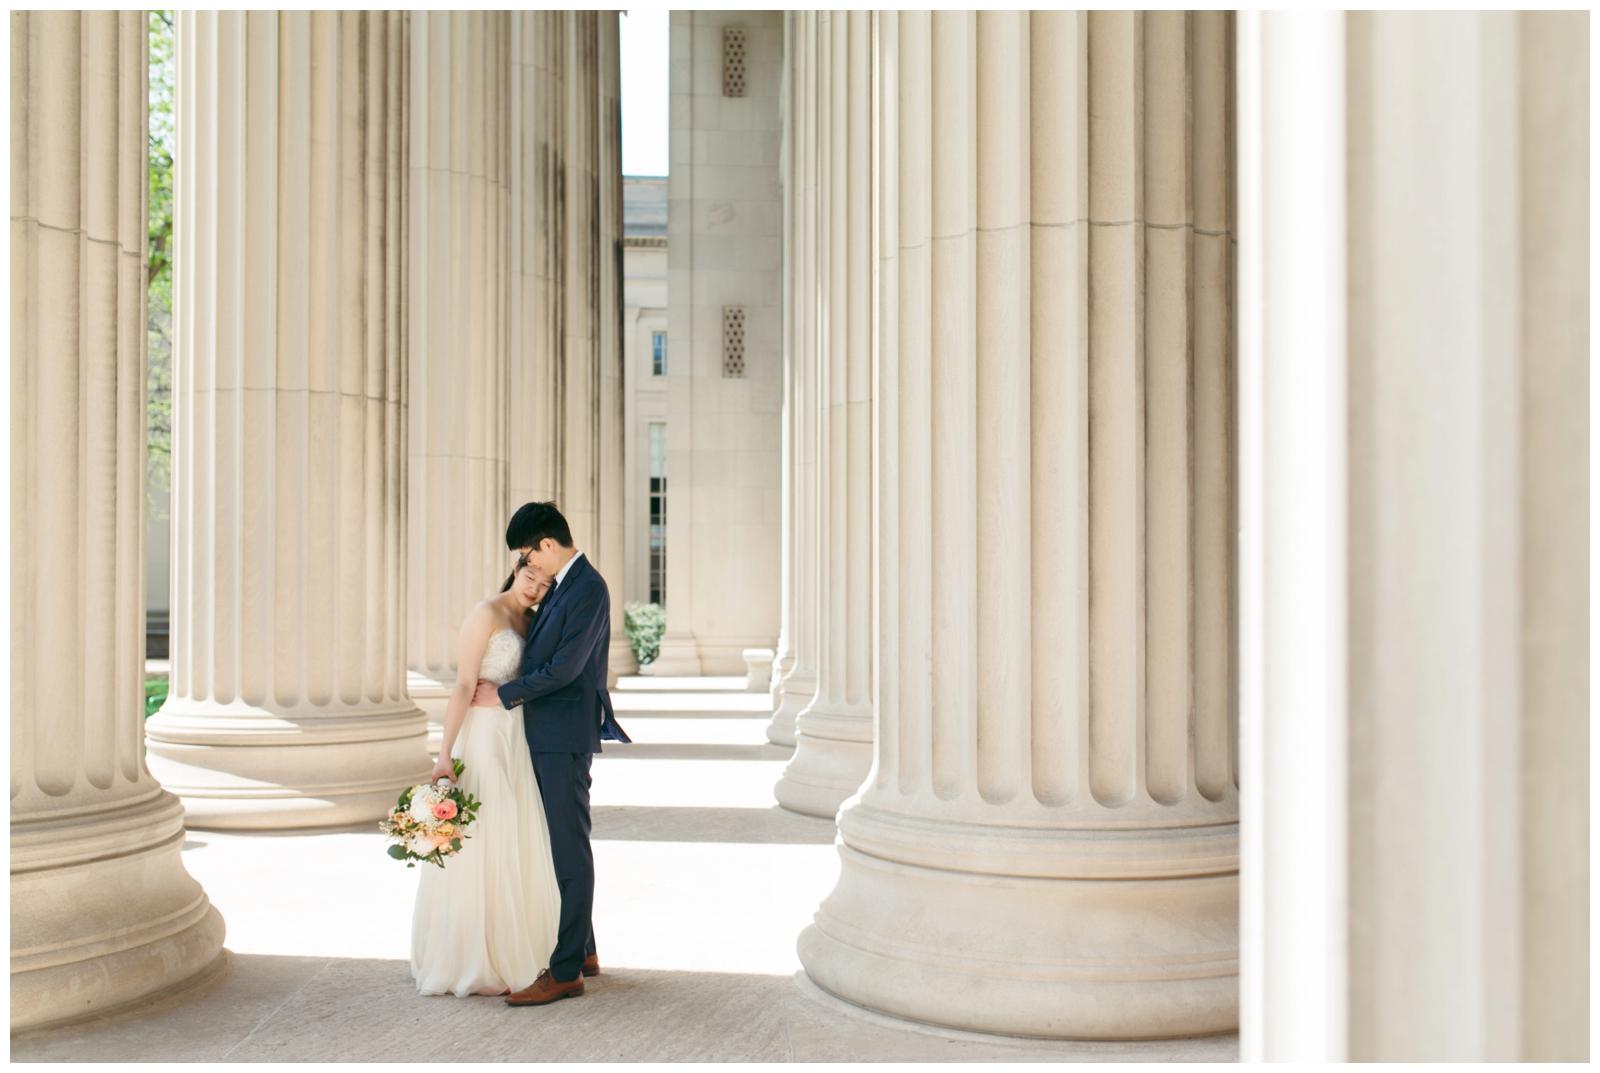 Samberg-Conference-Center-Boston-Wedding-Photographer-Bailey-Q-Photo-084.jpg